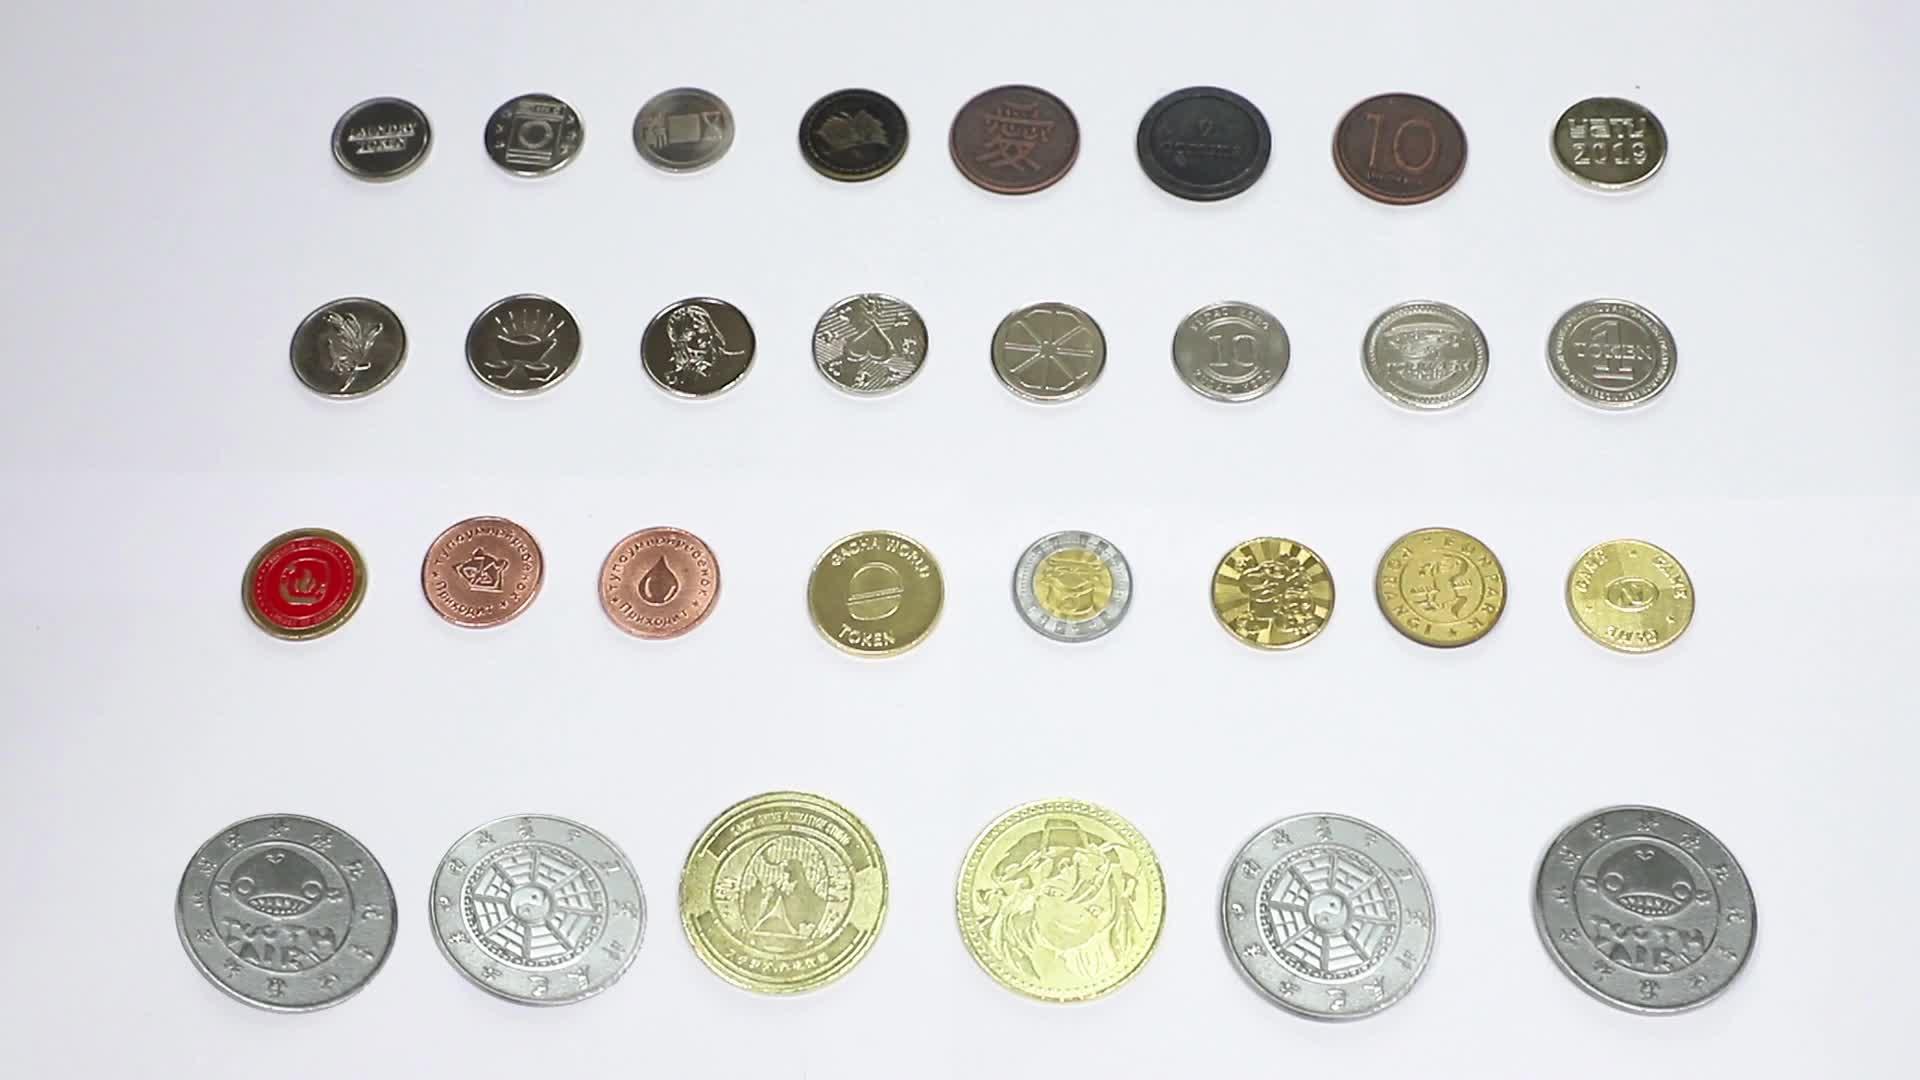 A1 Hot sale die commemorative bezel bitcoin trump euro challenge antiqu coin